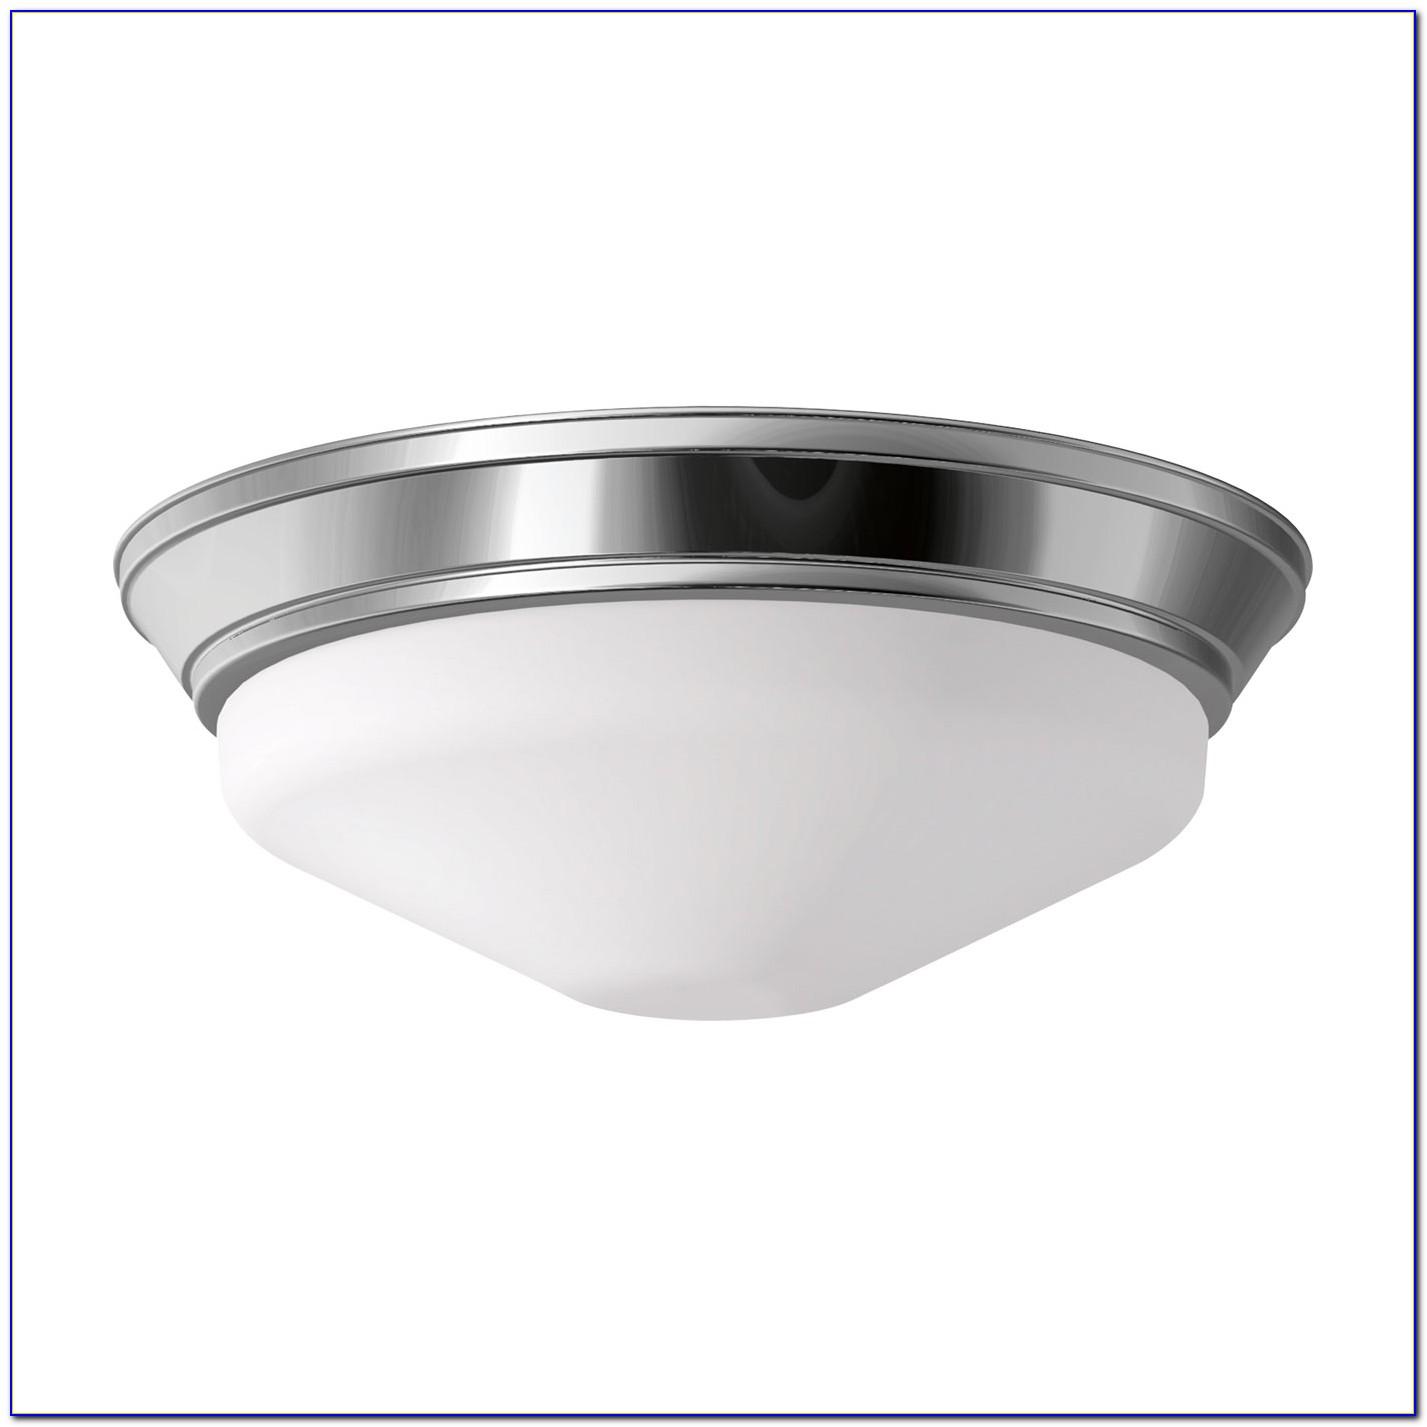 Ceiling Light Flush Mount Brushed Nickel